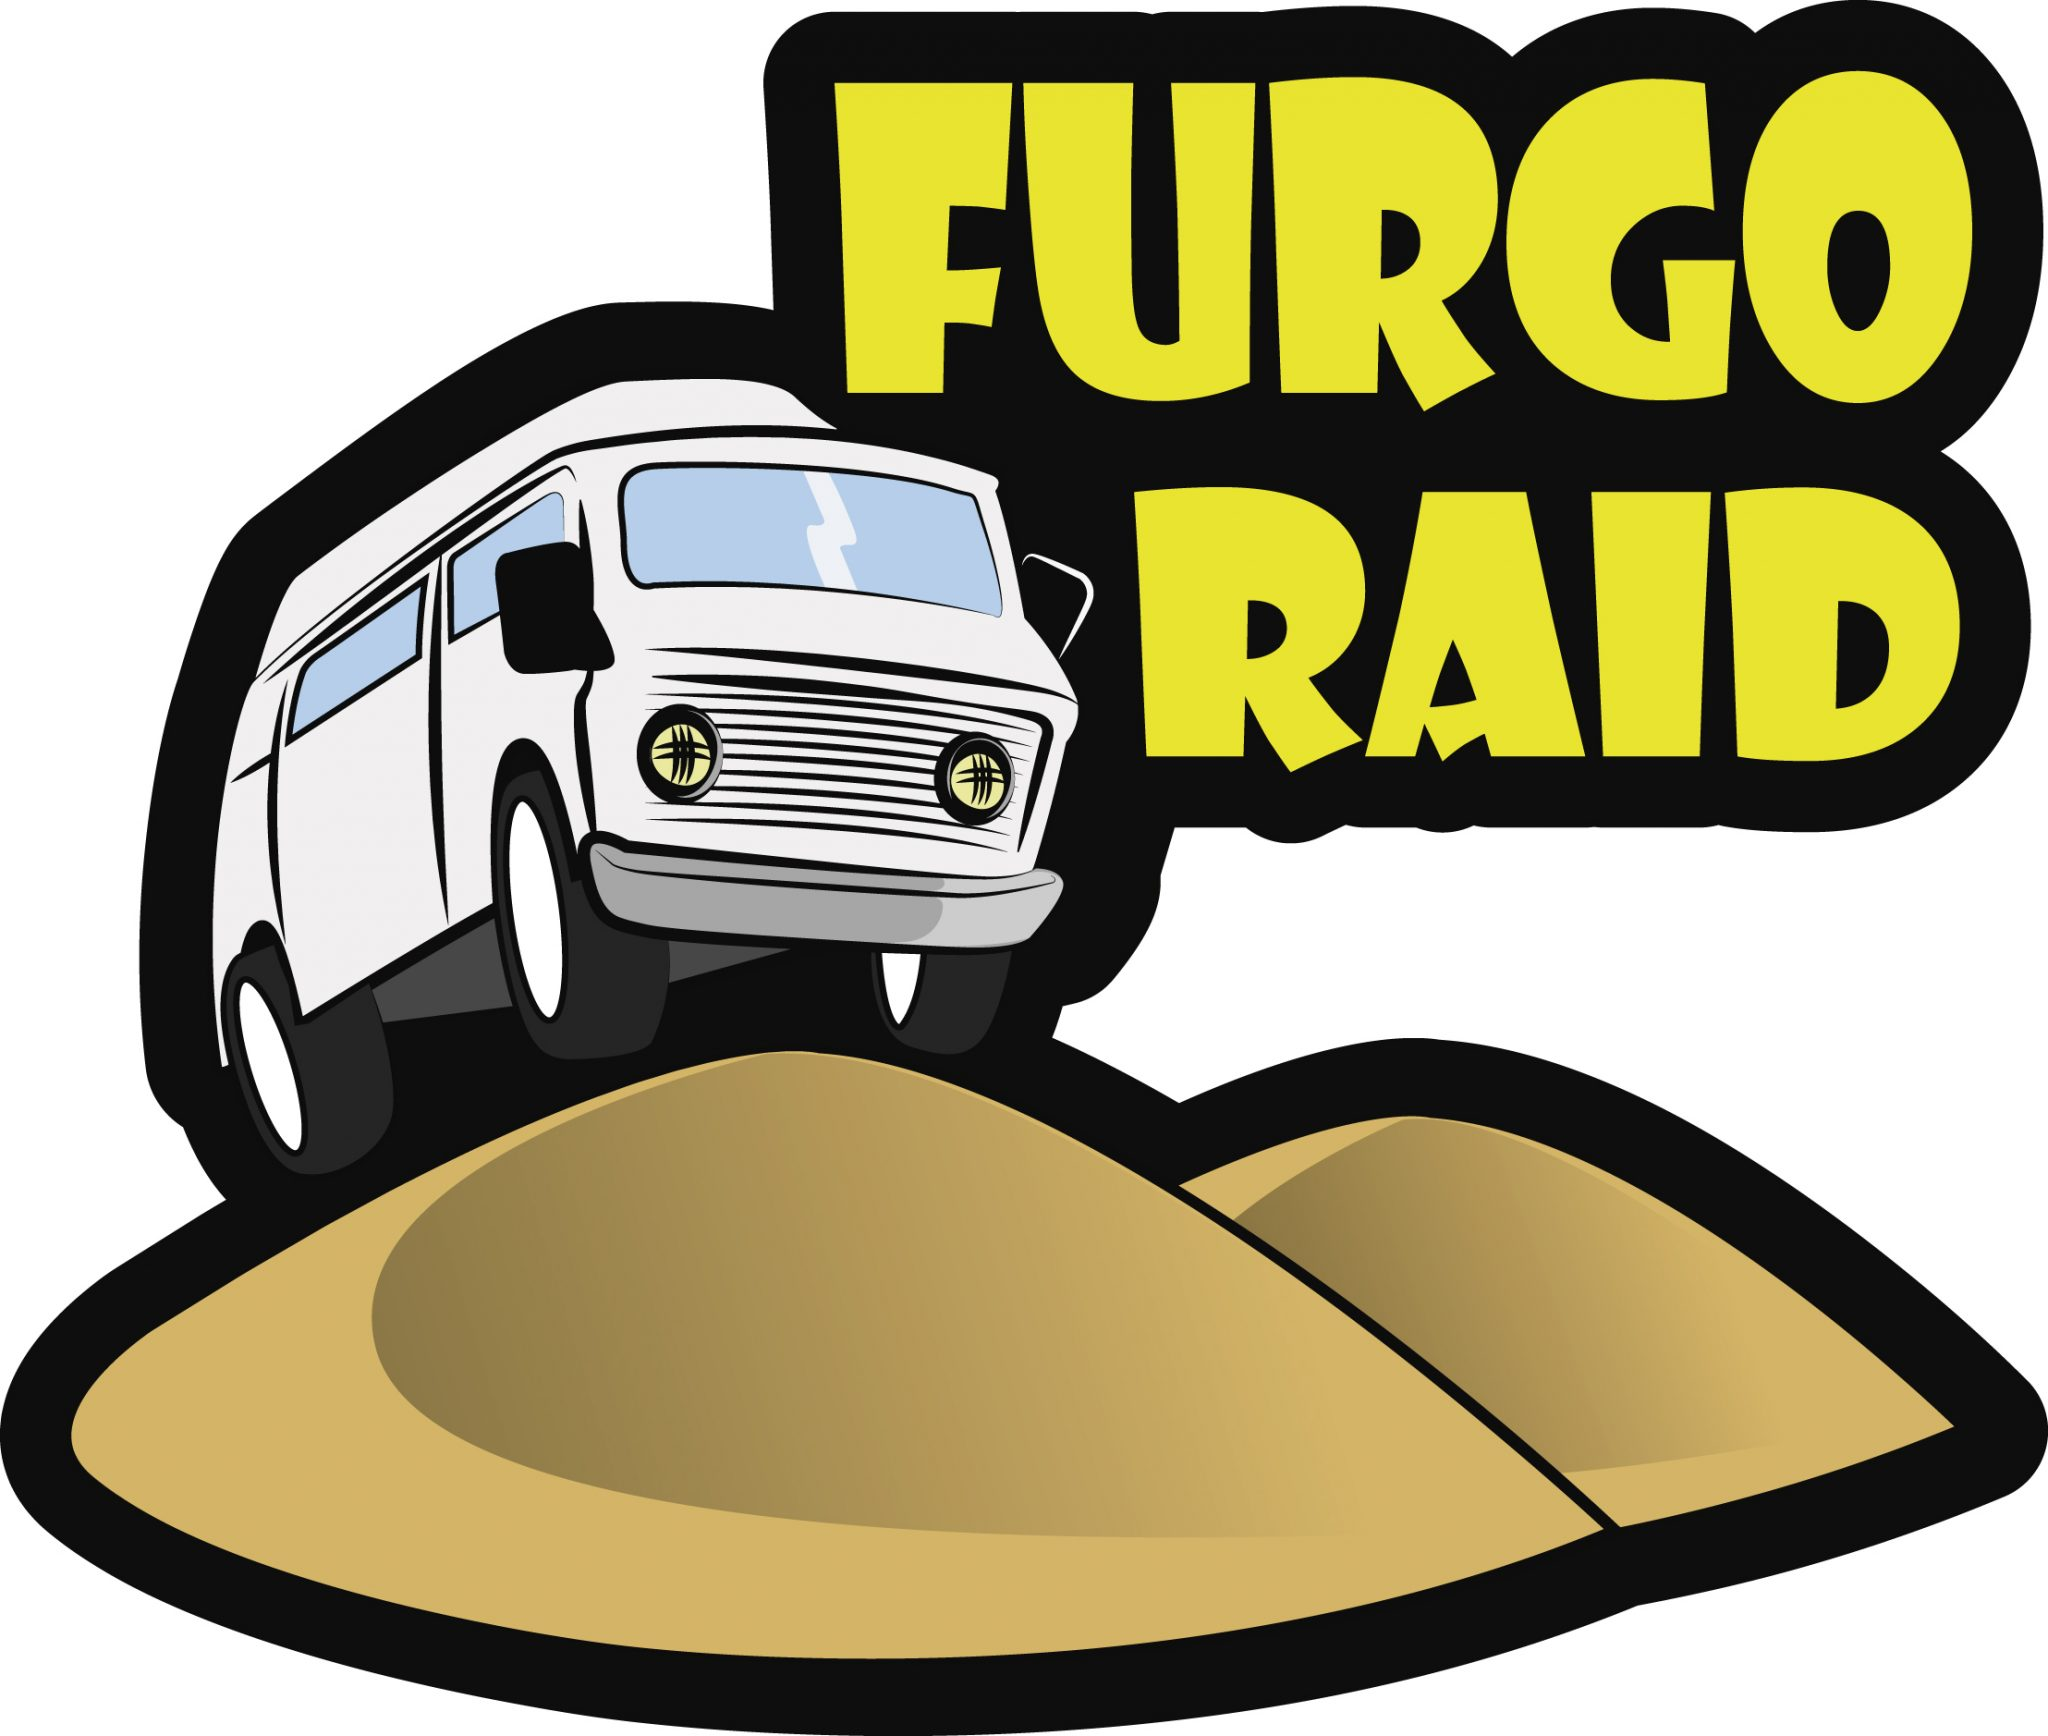 Furgo Raid